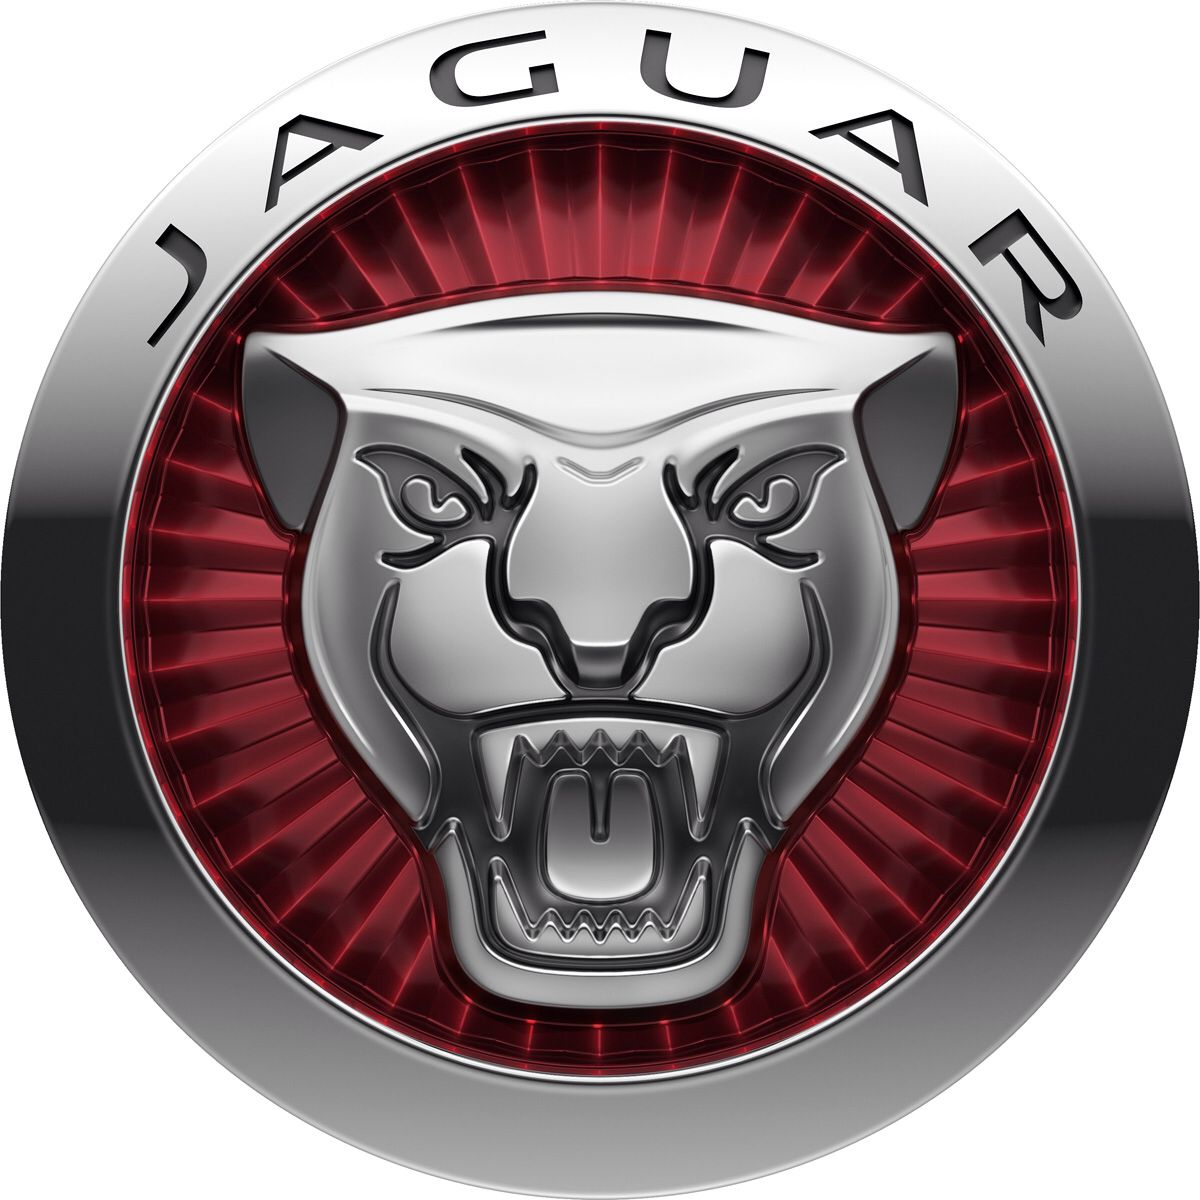 Jaguar LogoXoXo Jaguar school logo Pinterest